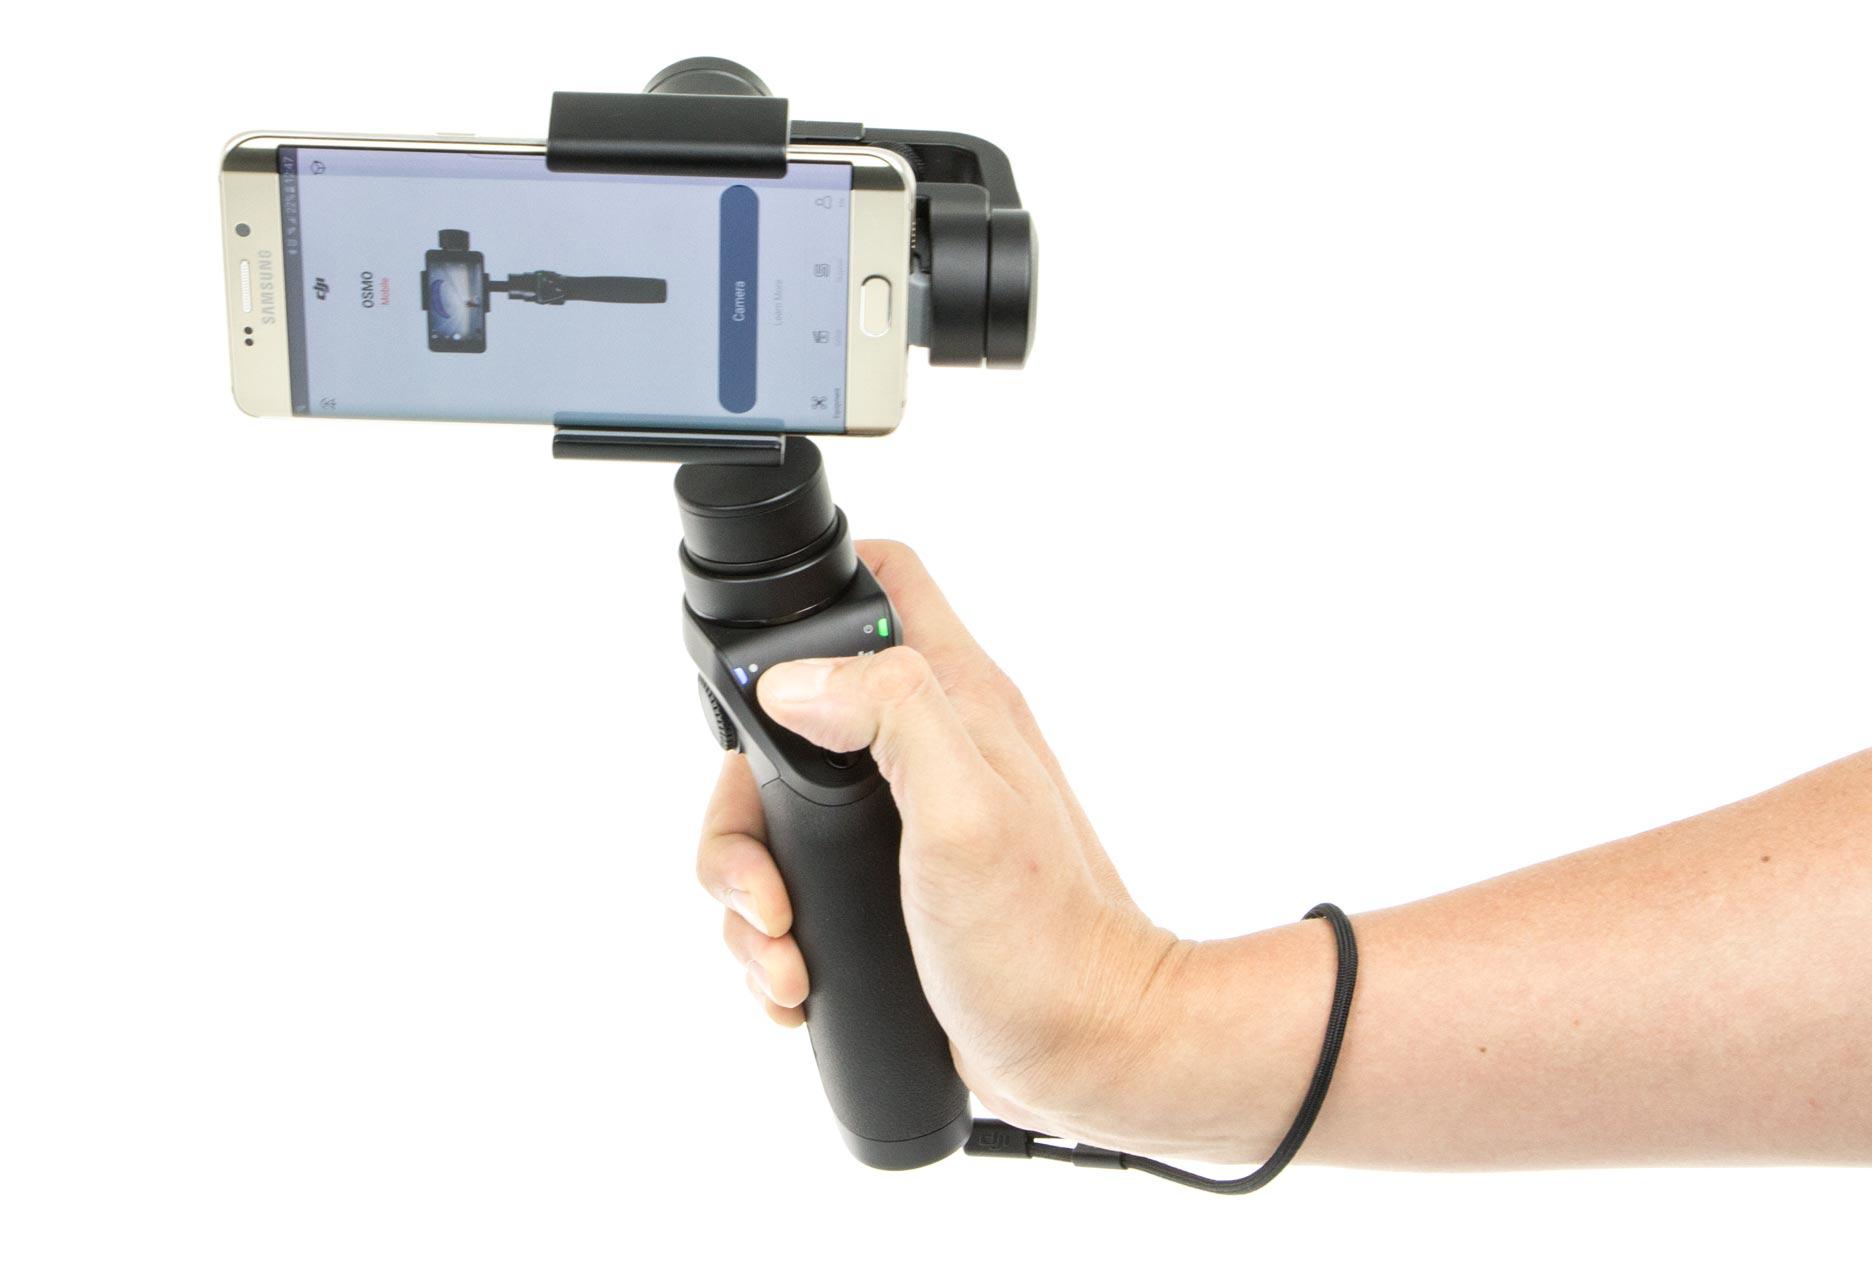 Dji Osmo Mobile Test Rcznego Gimbala Dla Smartfona Zenmuse M1